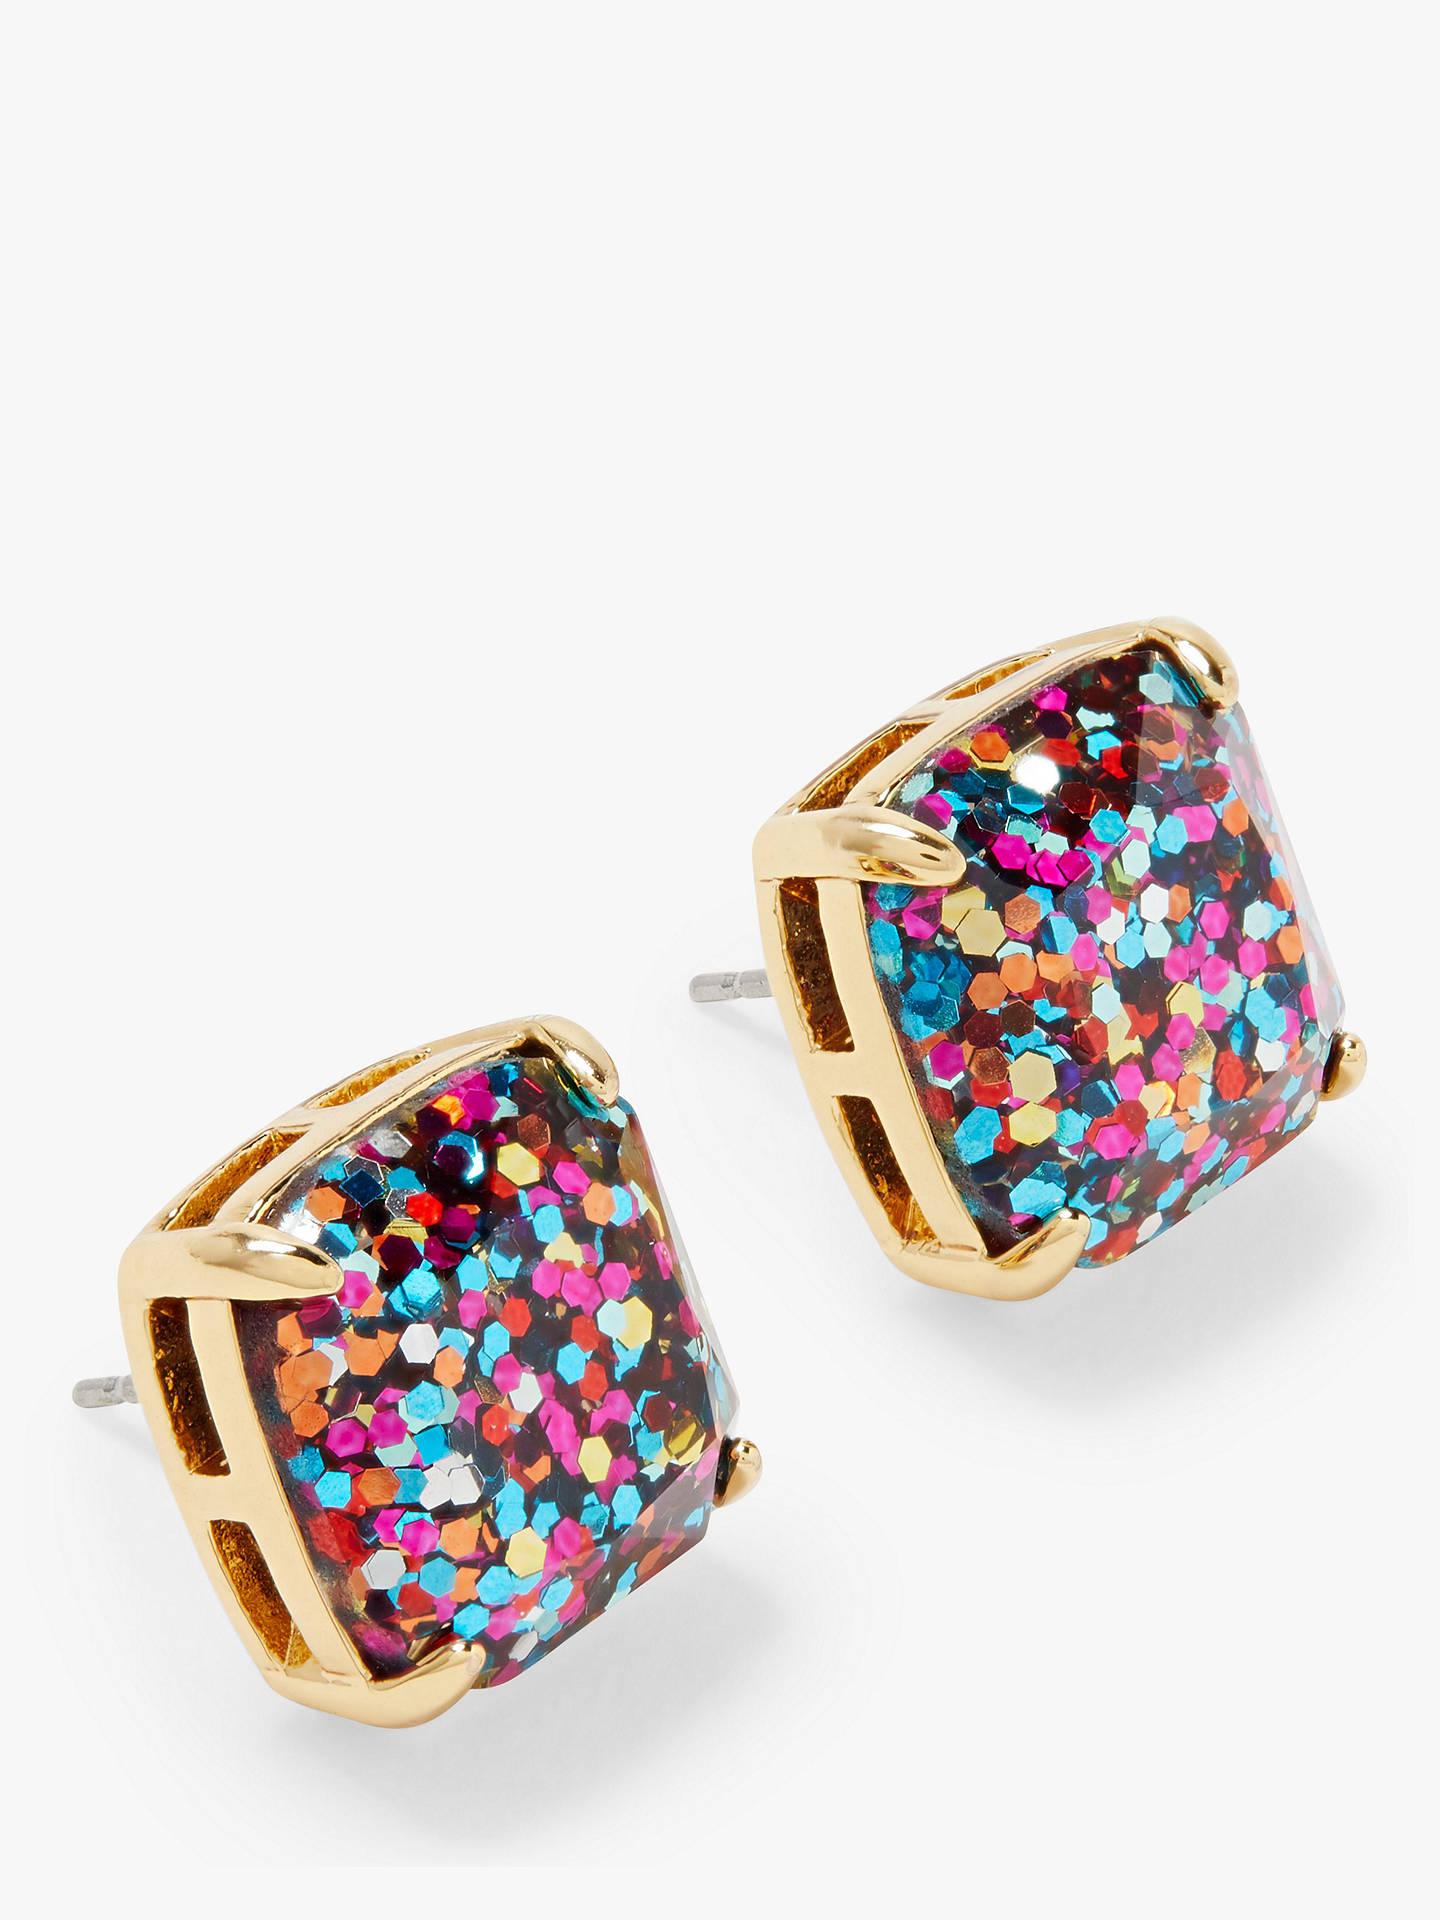 Kate Spade New York Small Square Glitter Stud Earrings Gold Multi Online At Johnlewis